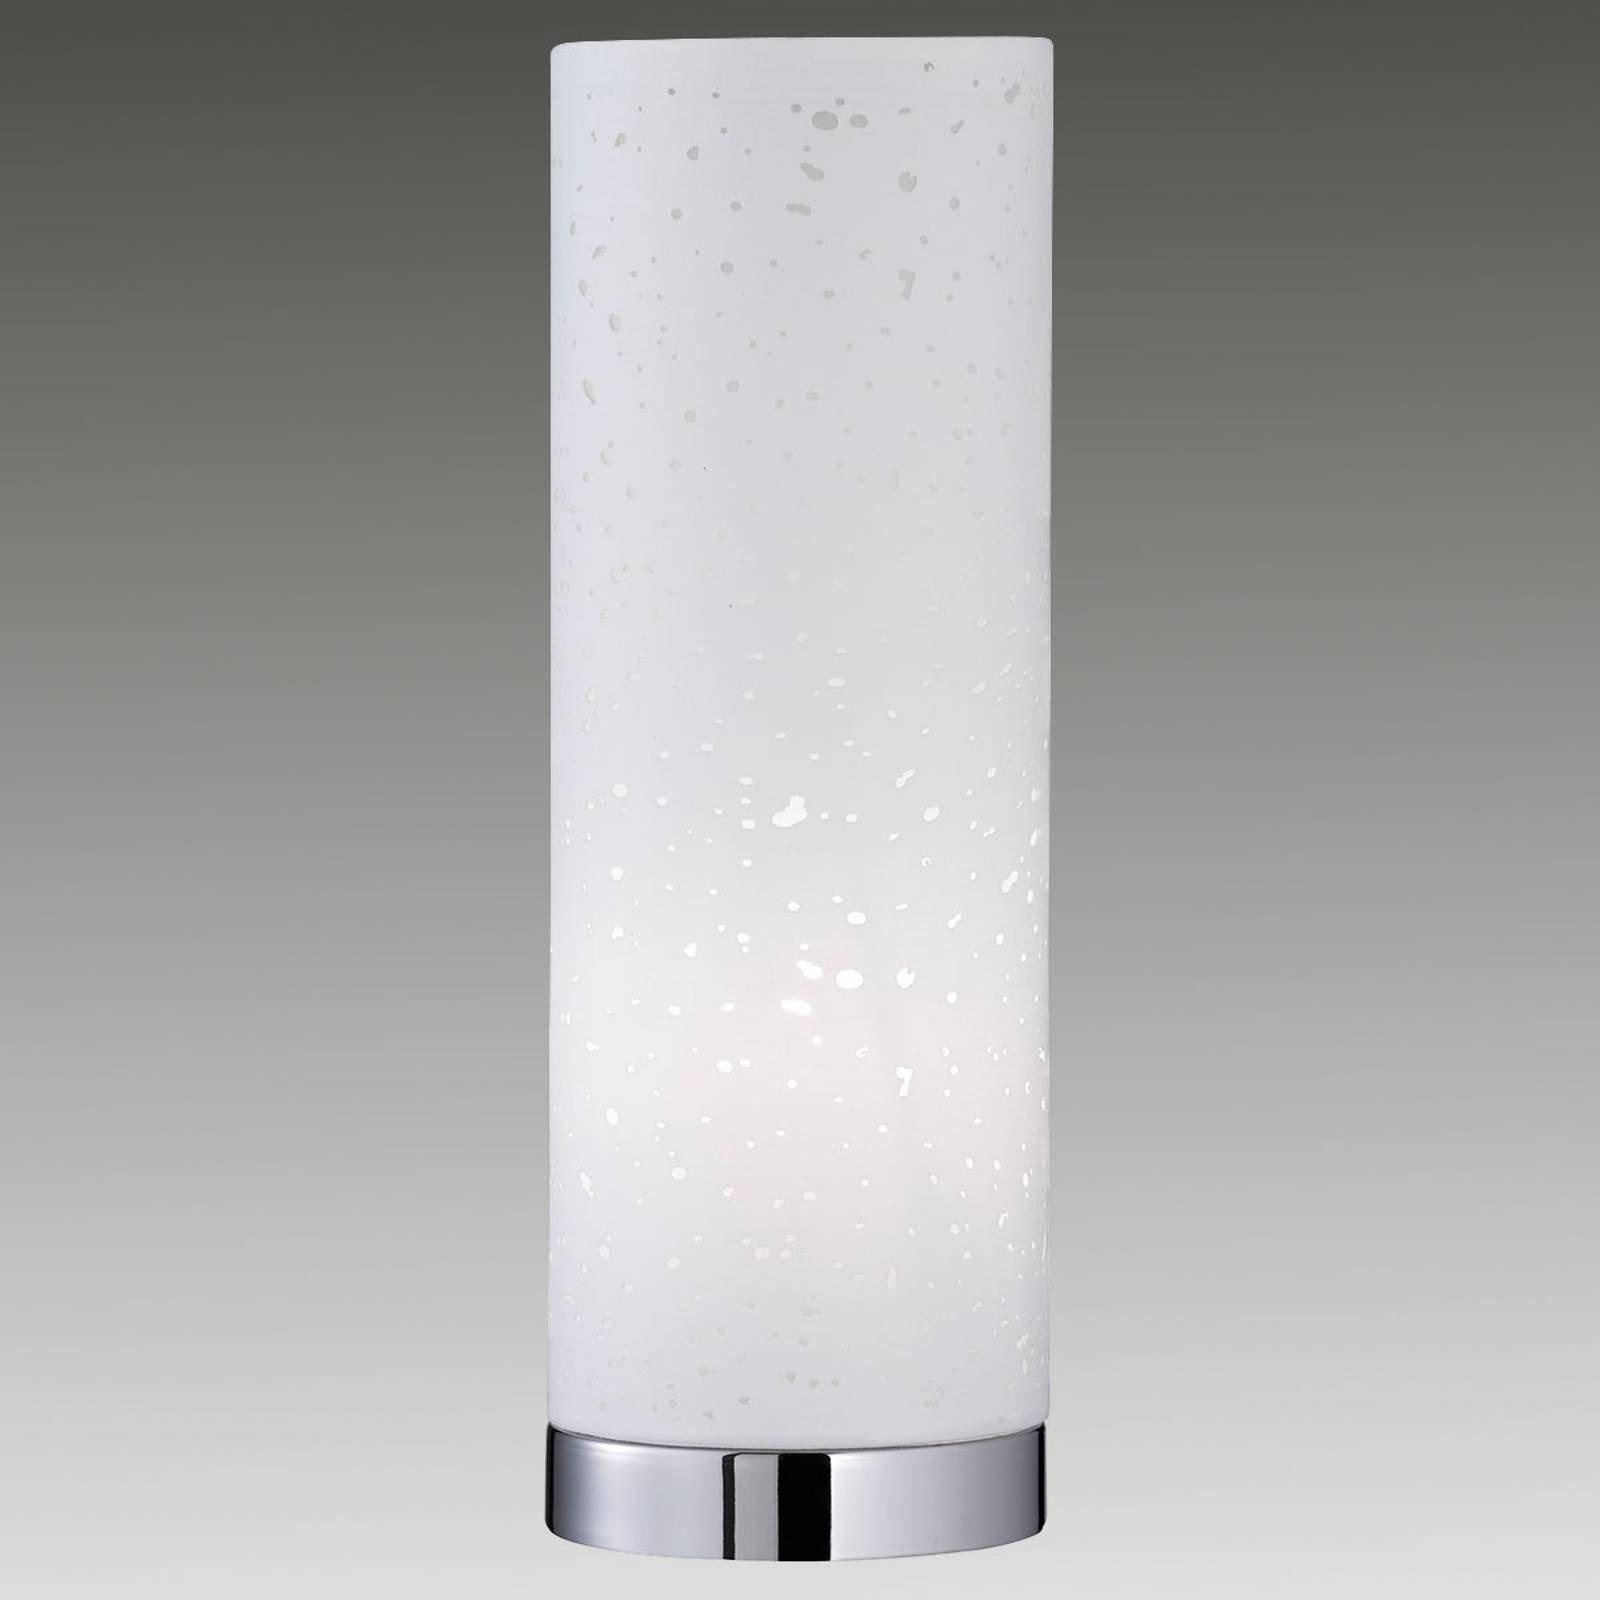 Bordlampe Thor hvit